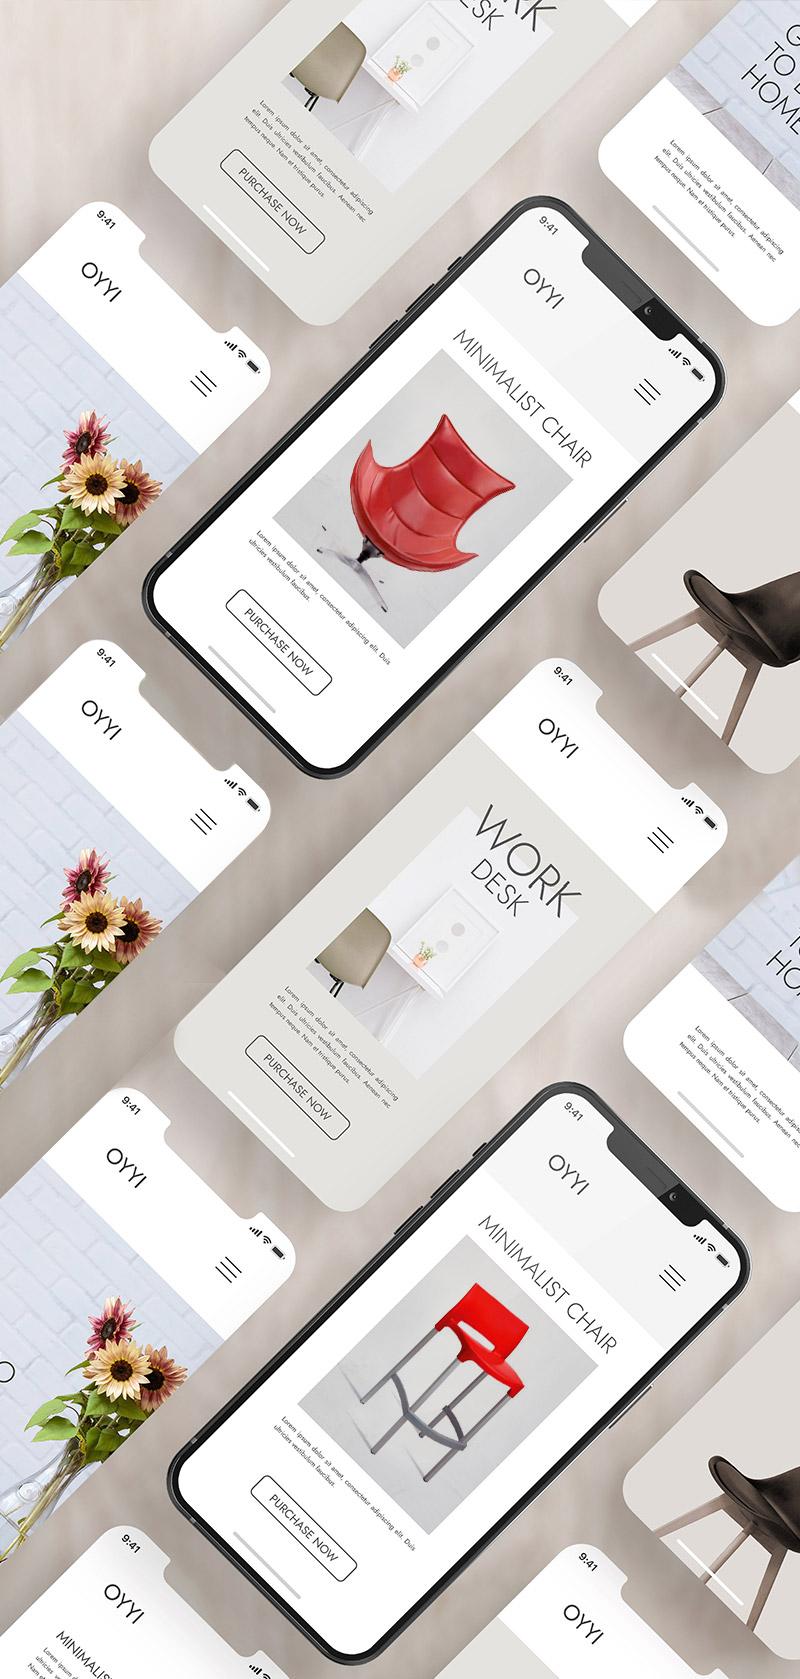 mobile-app-zentroa